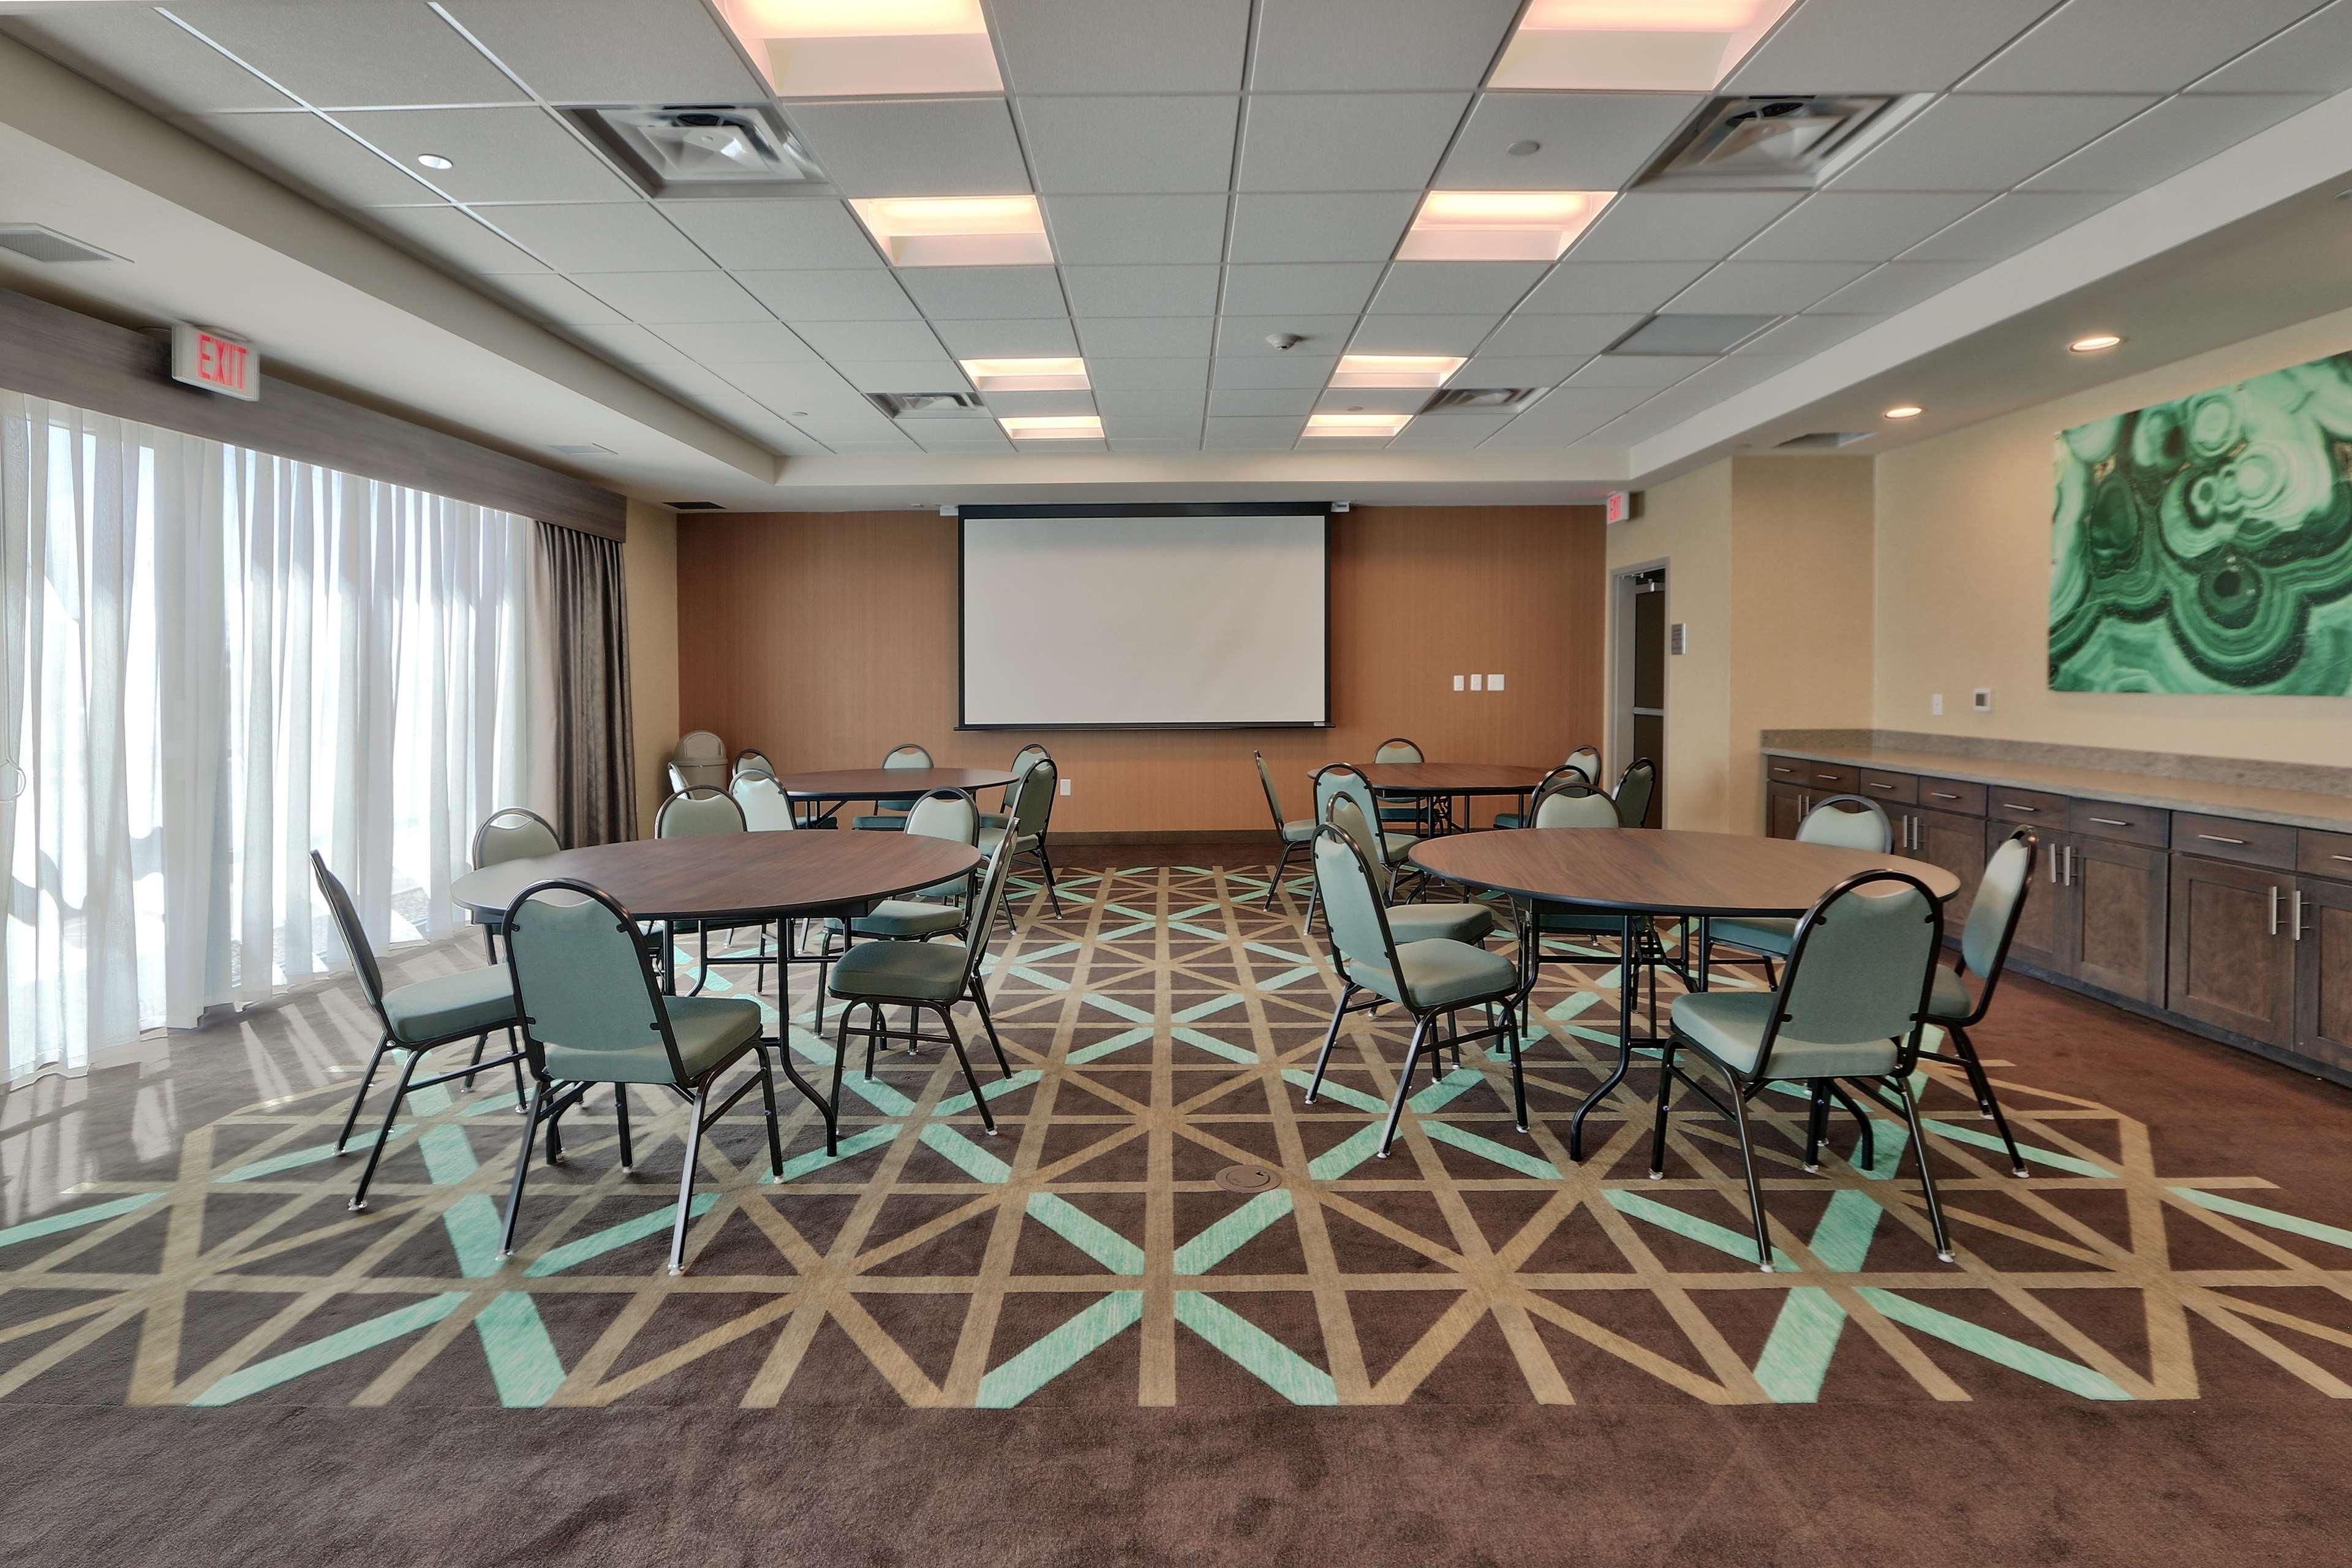 Hampton Inn & Suites Artesia image 6